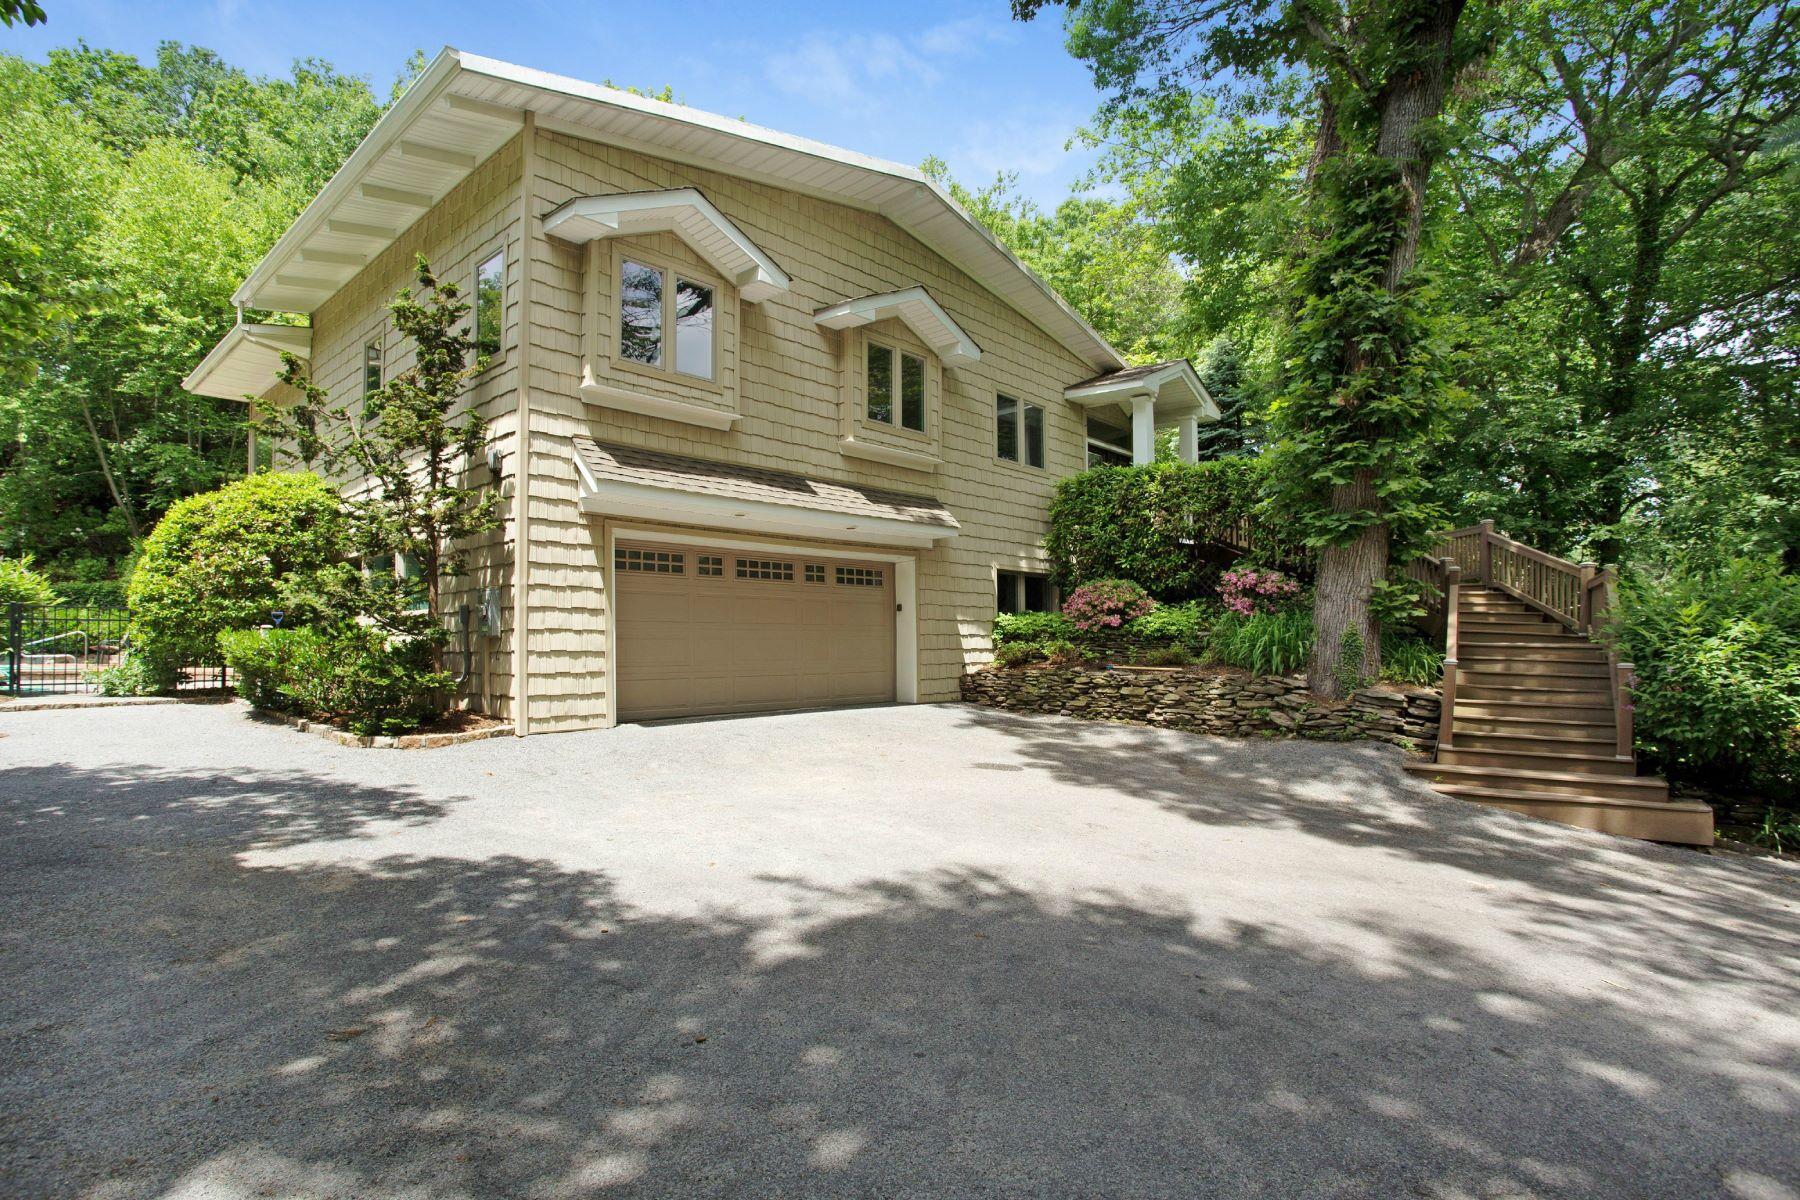 Villa per Vendita alle ore Exp Ranch 1524 Laurel Hollow Rd Laurel Hollow, New York, 11791 Stati Uniti